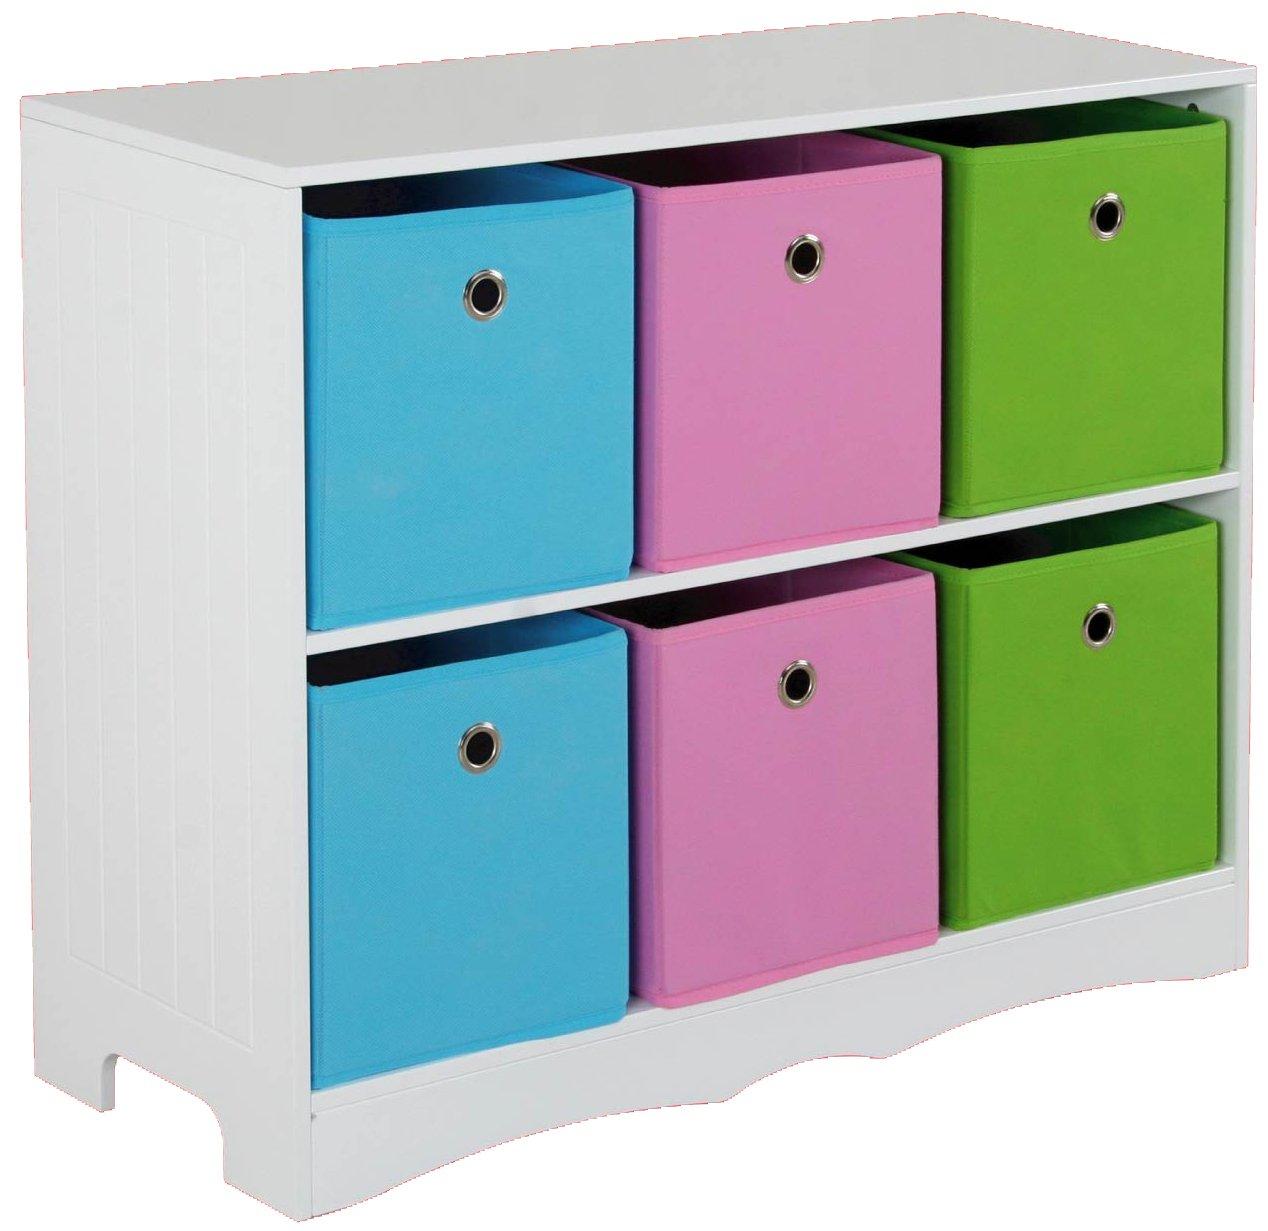 Home Basics Six Bin Storage Shelf: Amazon.co.uk: Kitchen & Home